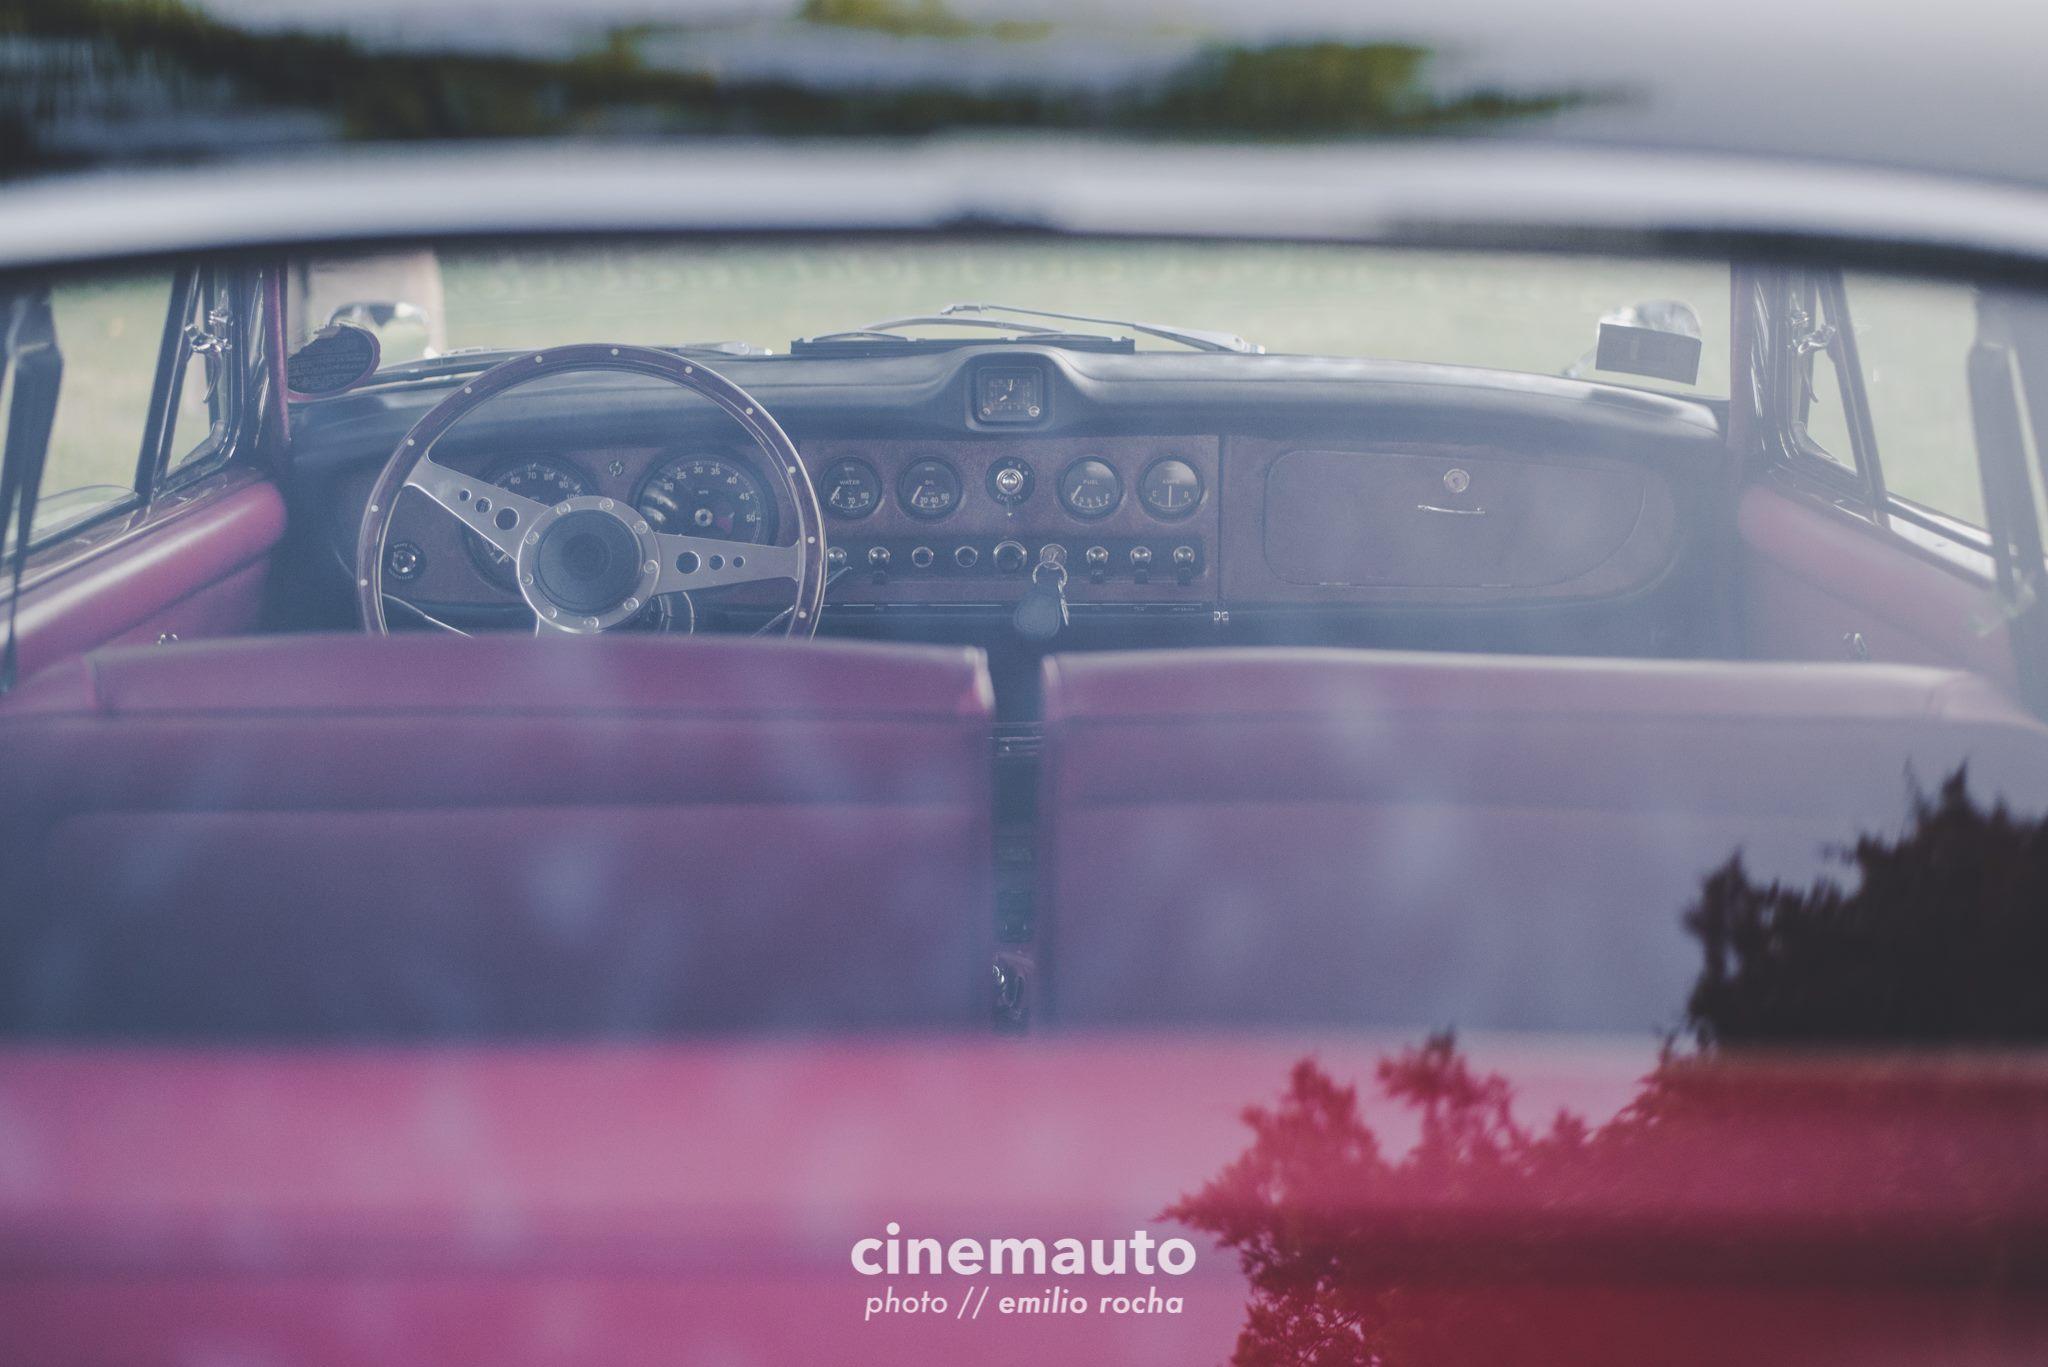 cinemauto-er7.jpg